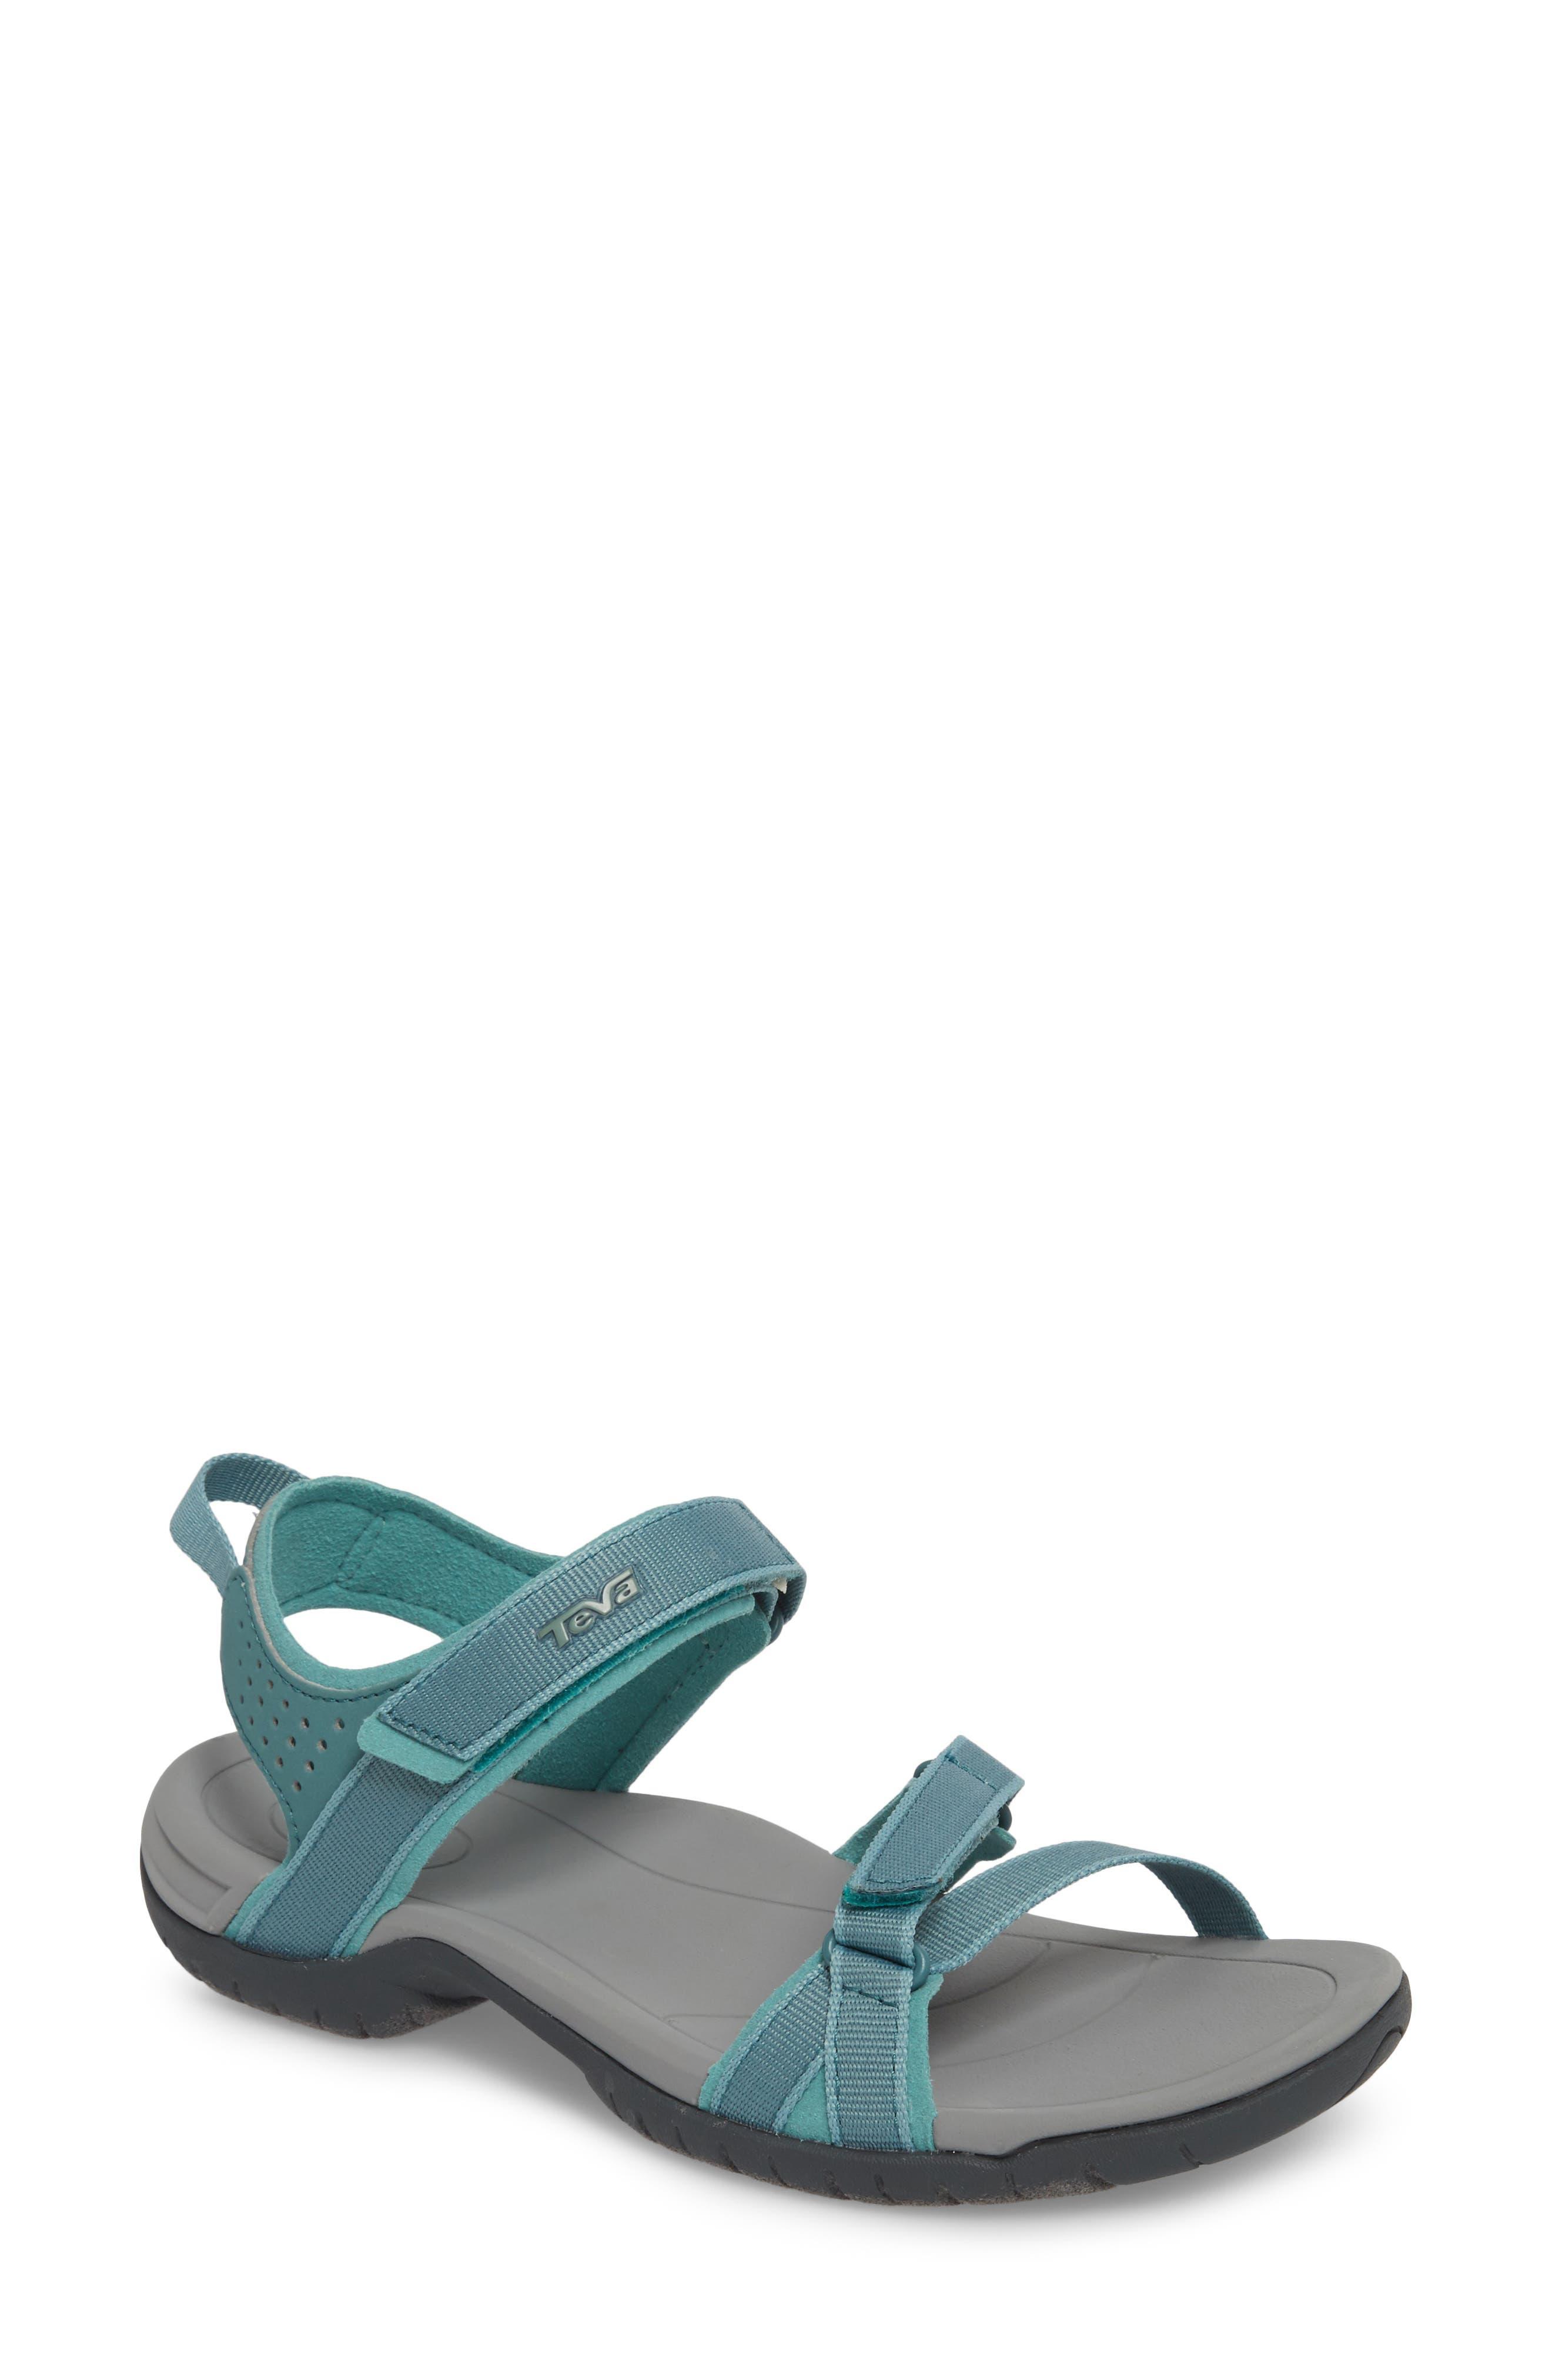 Main Image - Teva 'Verra' Sandal (Women)